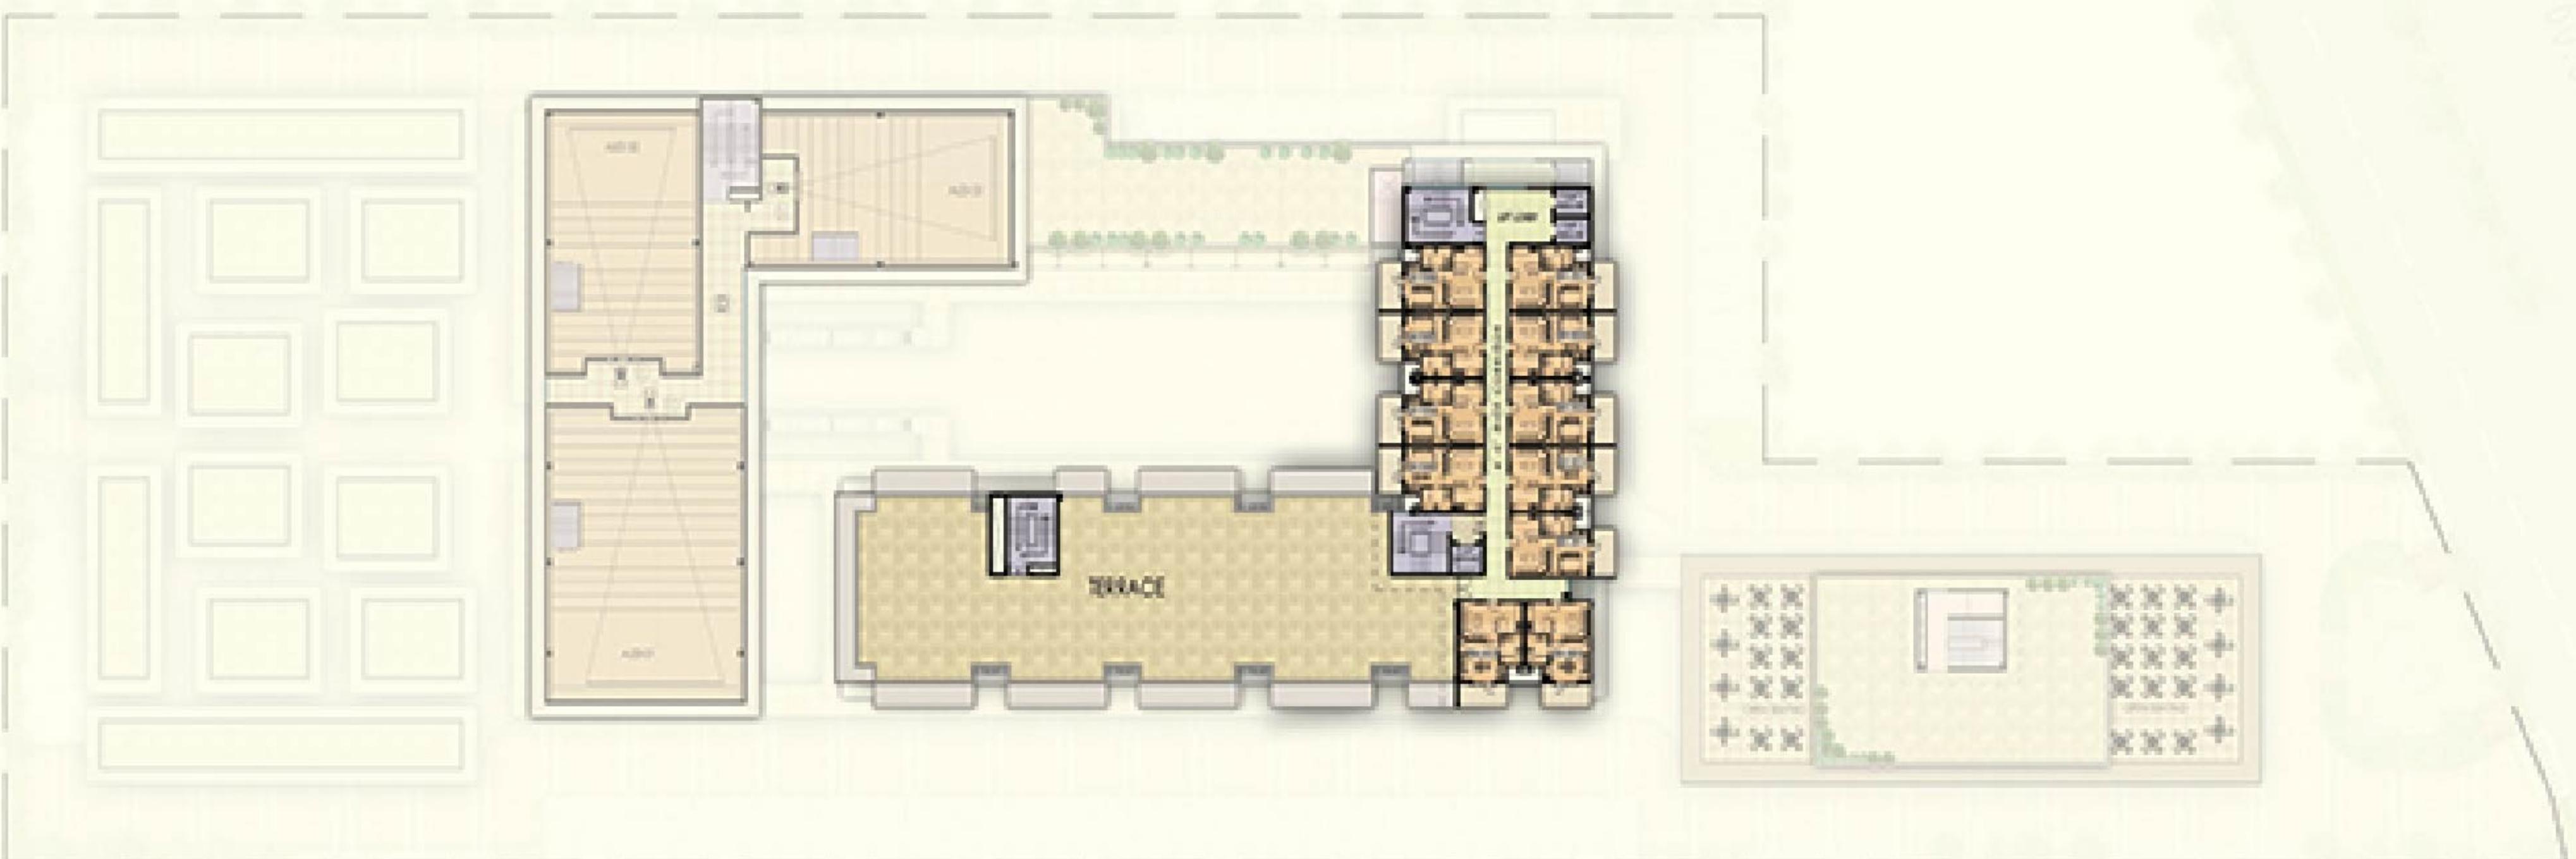 Orchard Central Floor Plan Particular living room